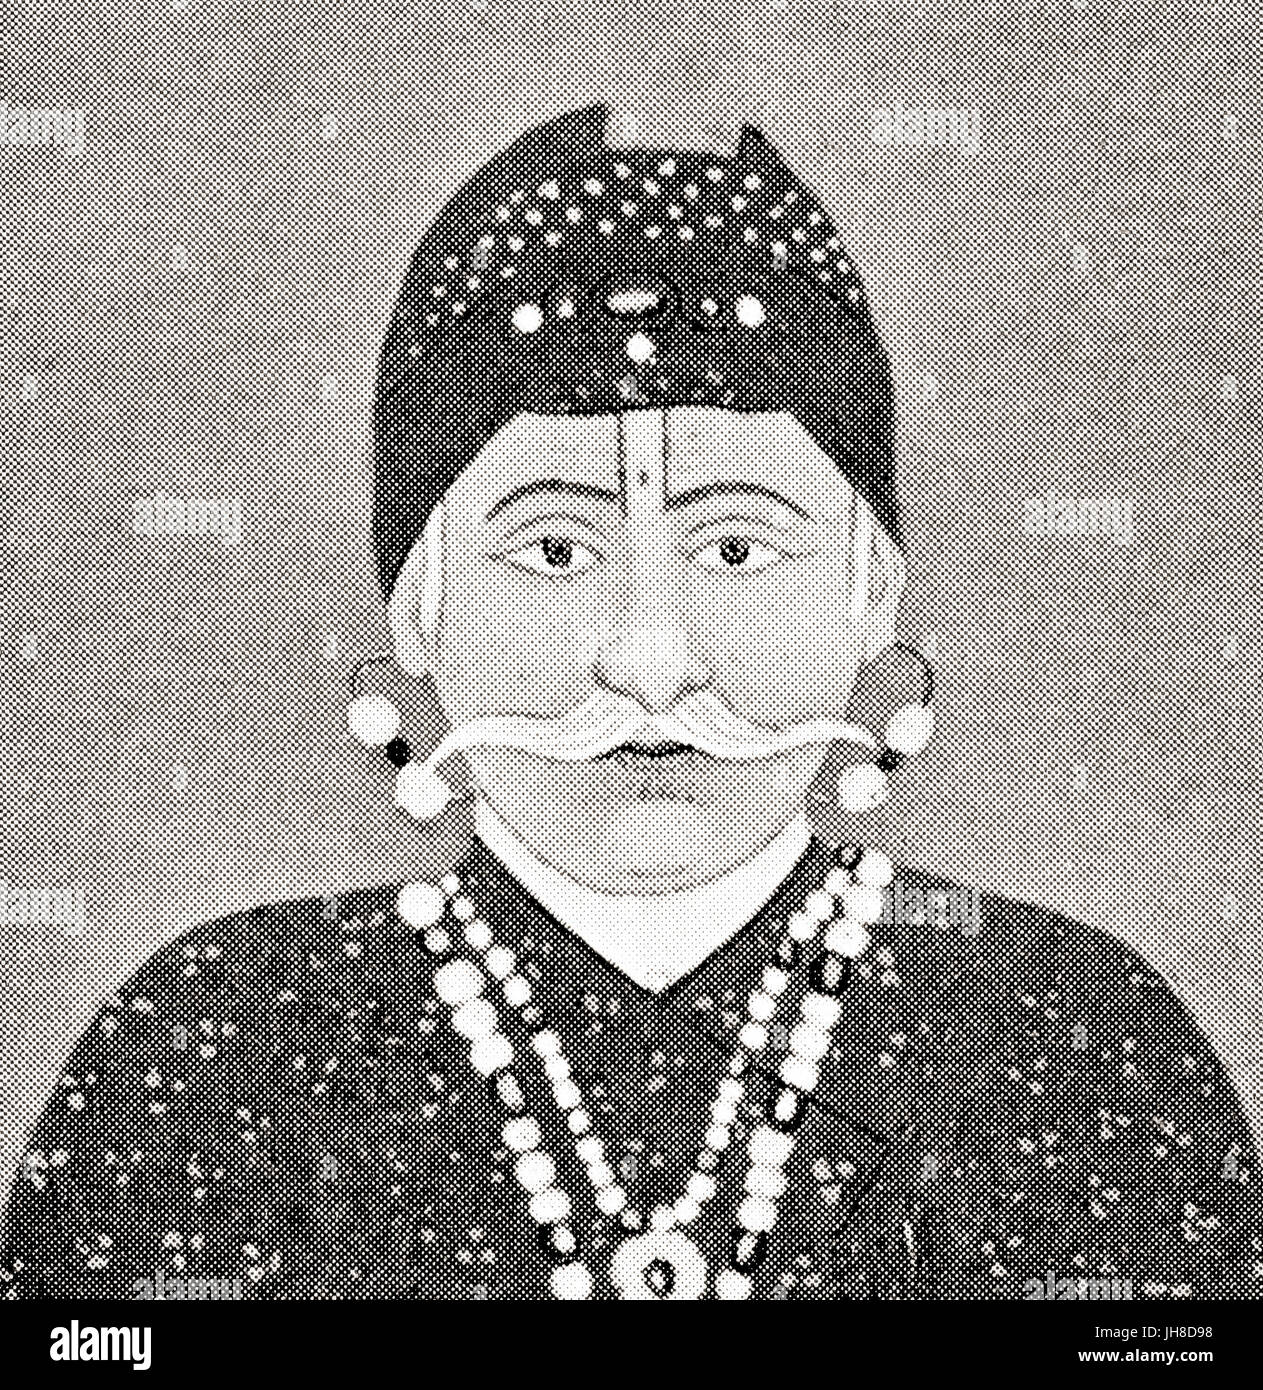 Abu'l-Fath Jalal-ud-din Muhammad, 1542 - 1605, aka Akbar I and Akbar the Great.  Third Mughal emperor,1556 to - Stock Image